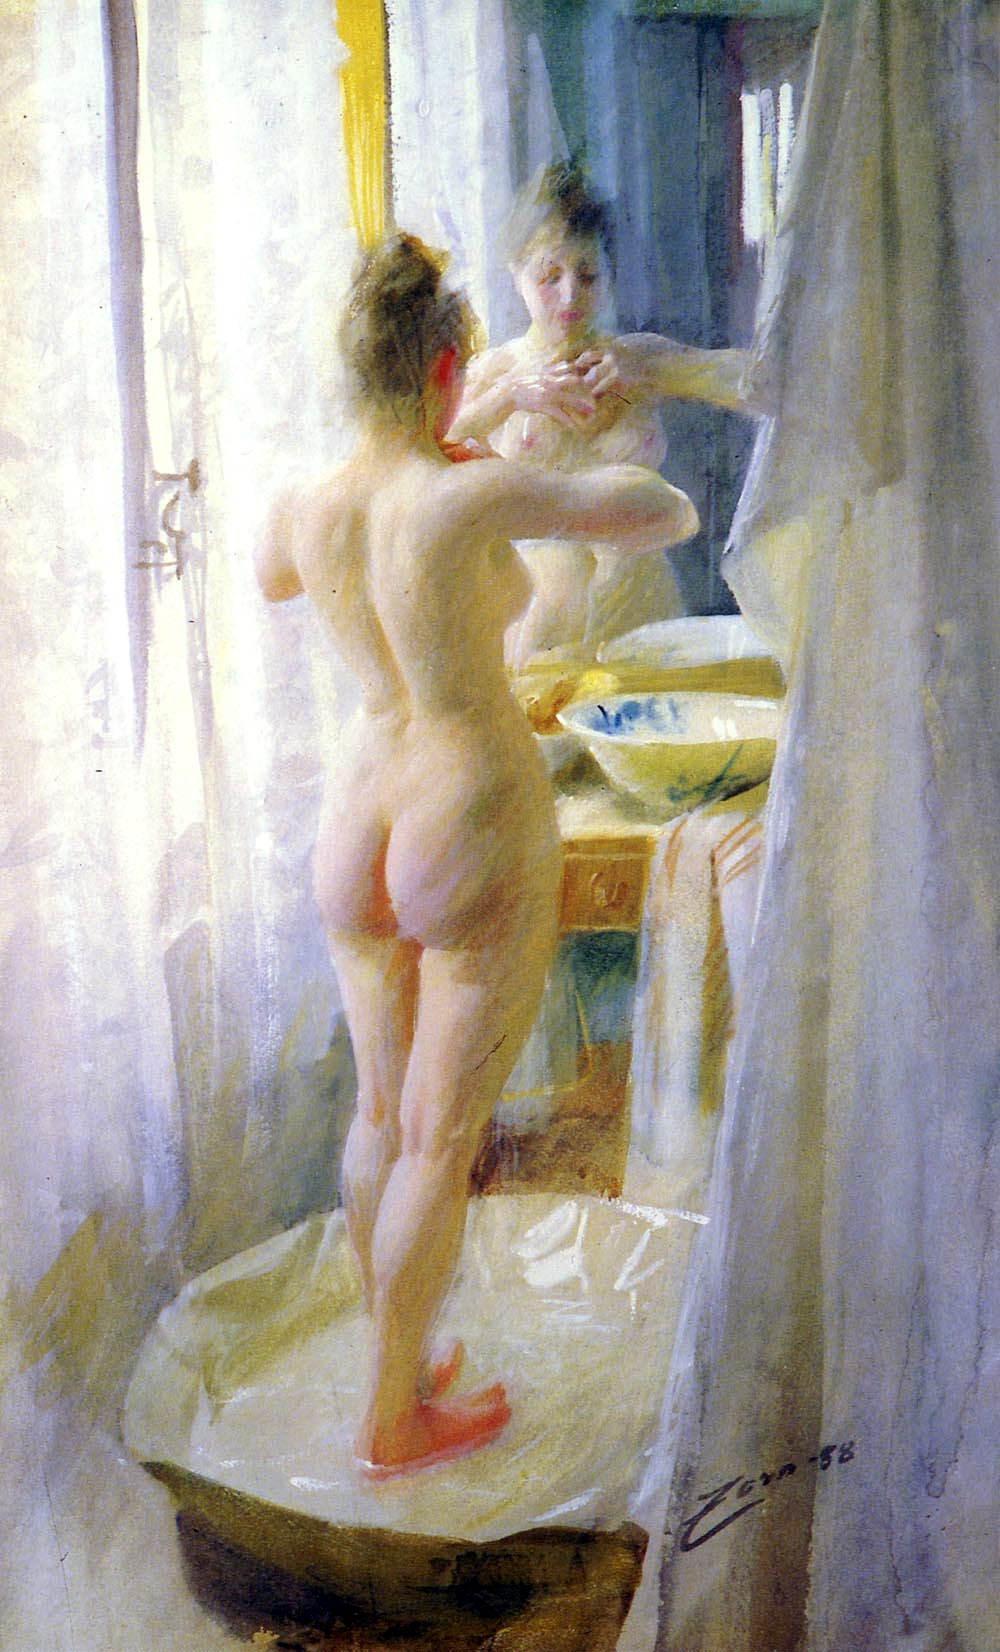 Anders Leonard Zorn. 1860-1920. Ванная комната. 1888, акварель. Частная коллекция